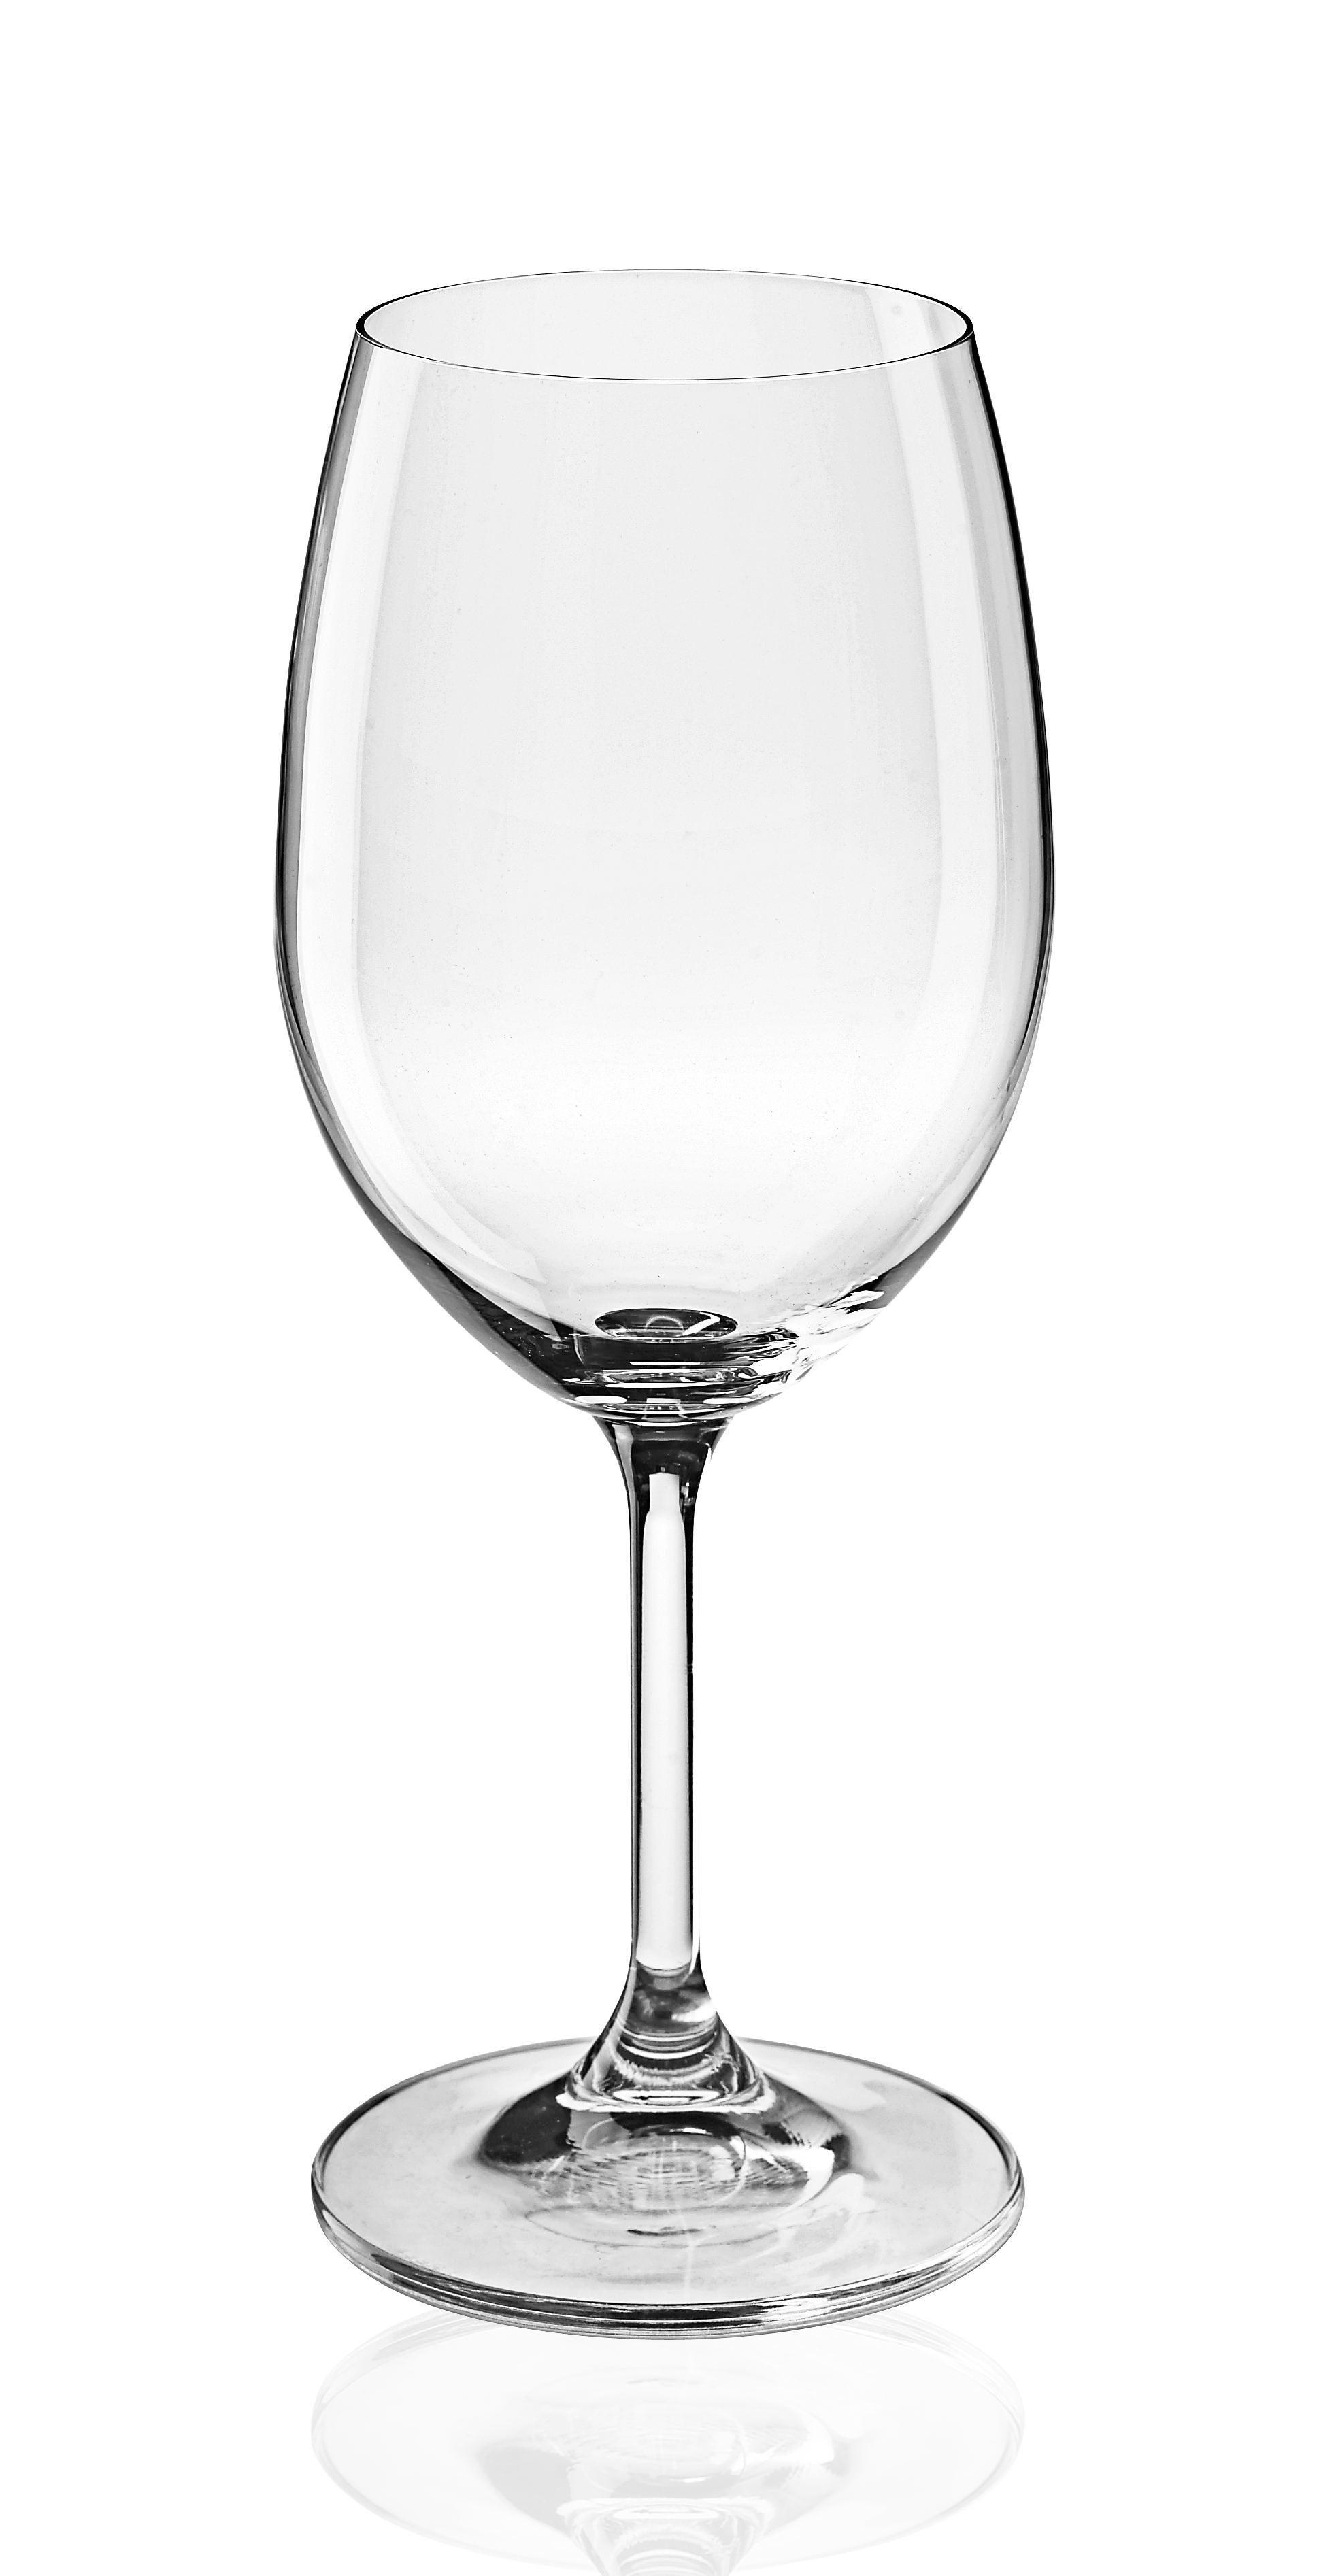 KOZAREC ZA RDEČE VINO - prozorna, Konvencionalno, steklo (0.45l) - HOMEWARE